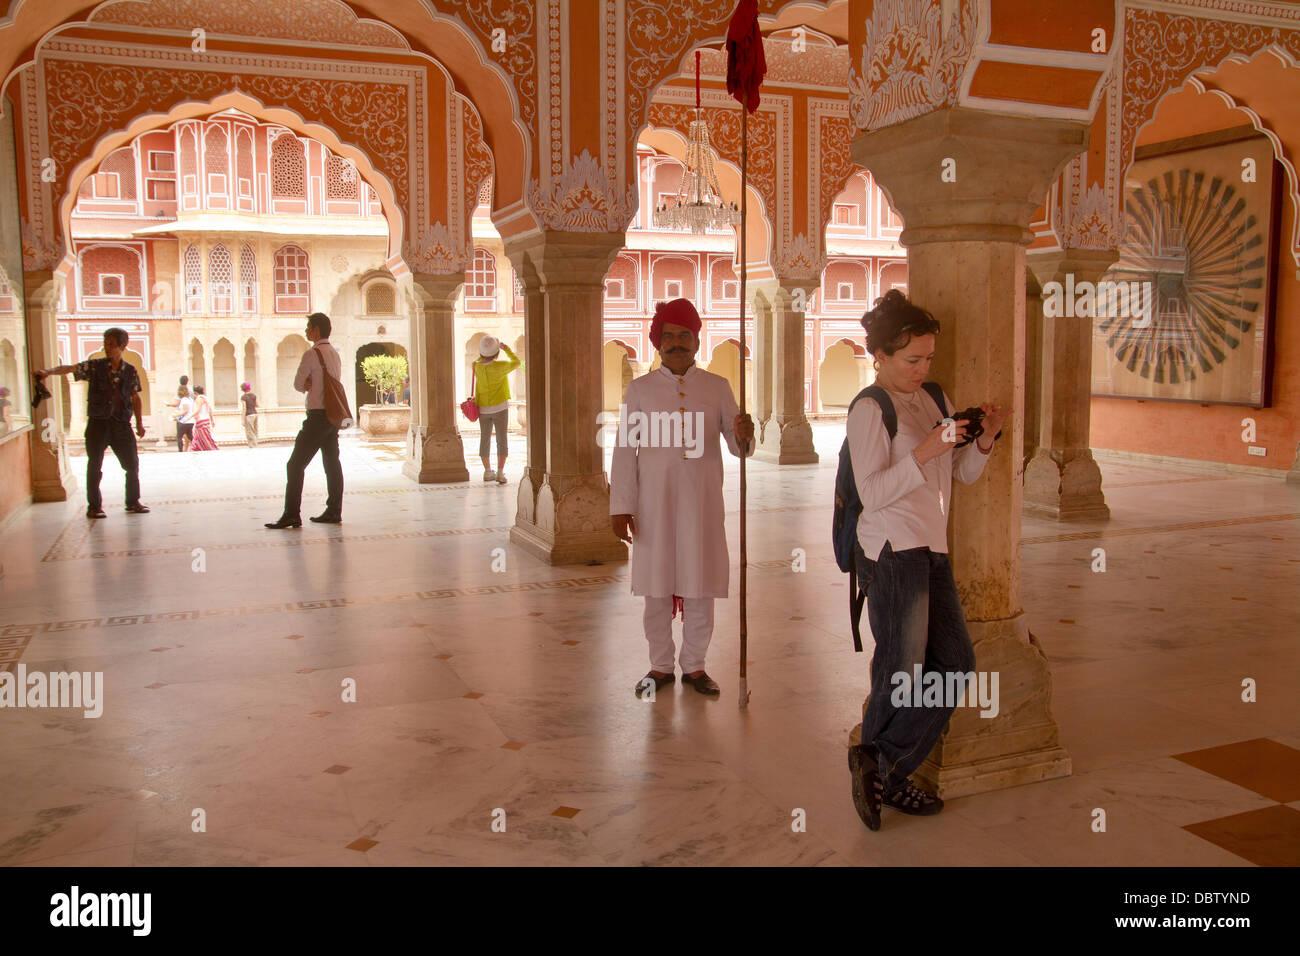 City Palace In Jaipur Rajasthan India - Stock Image